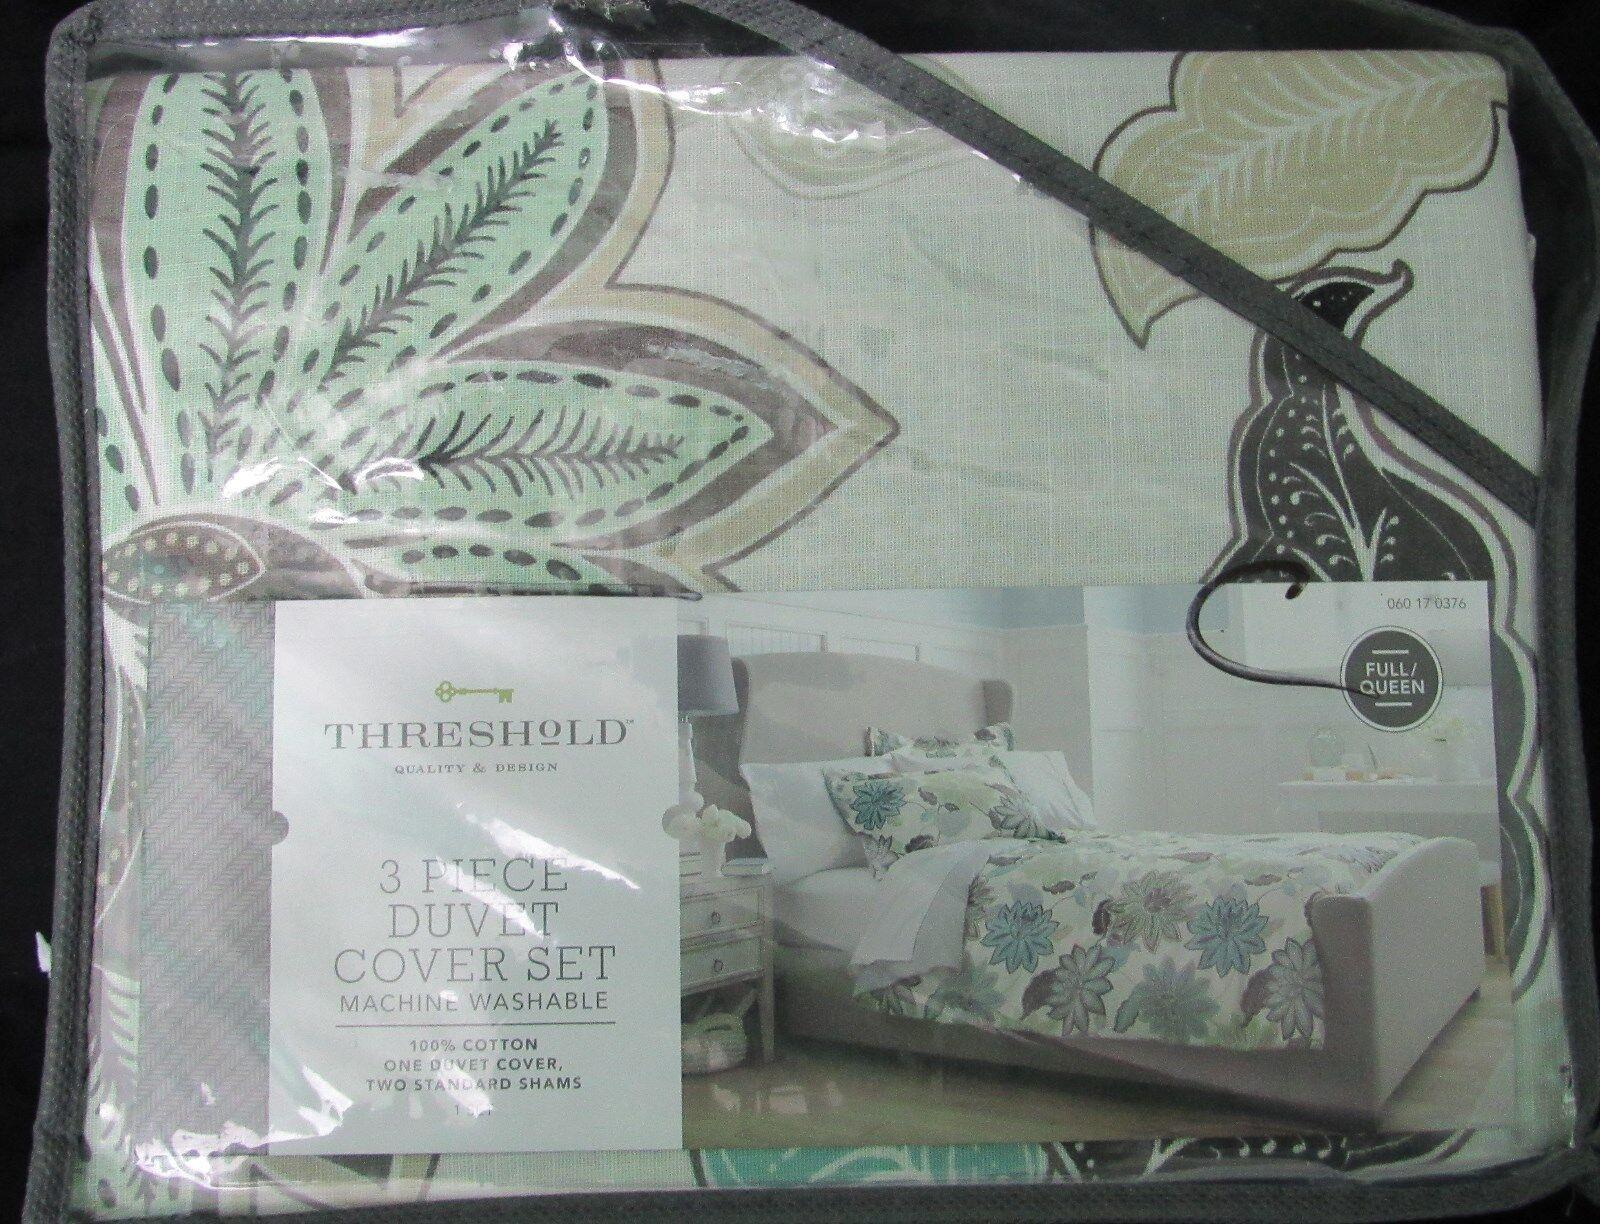 Threshold Floral Duvet Set F Q or King cotton 3 pc new